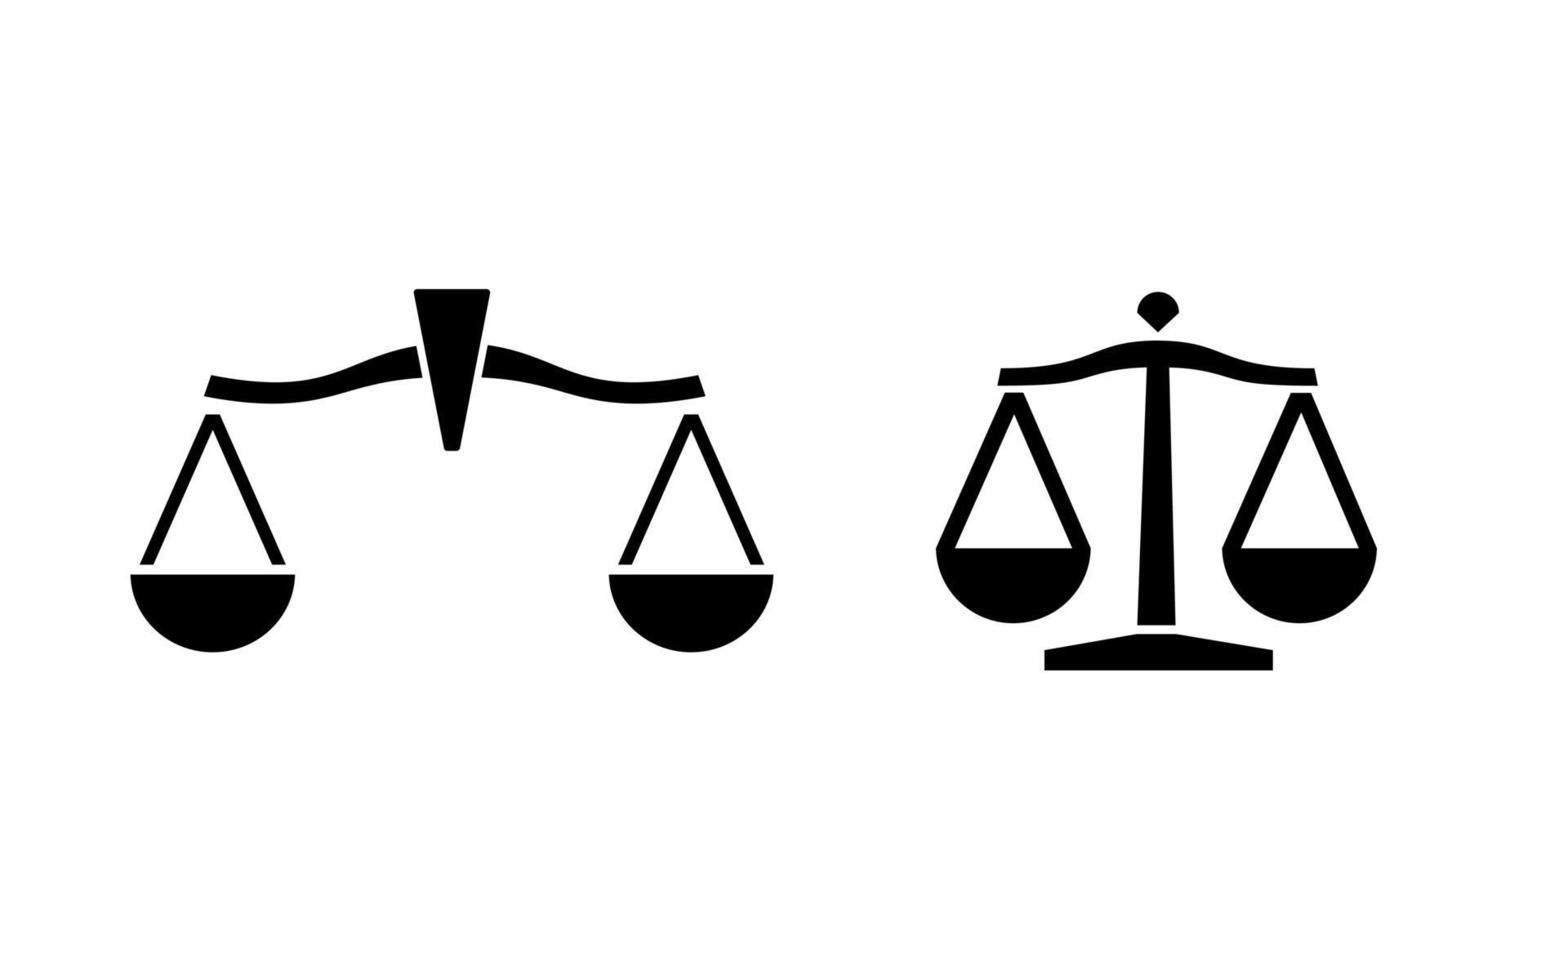 logotipo da balança jurídica vetor